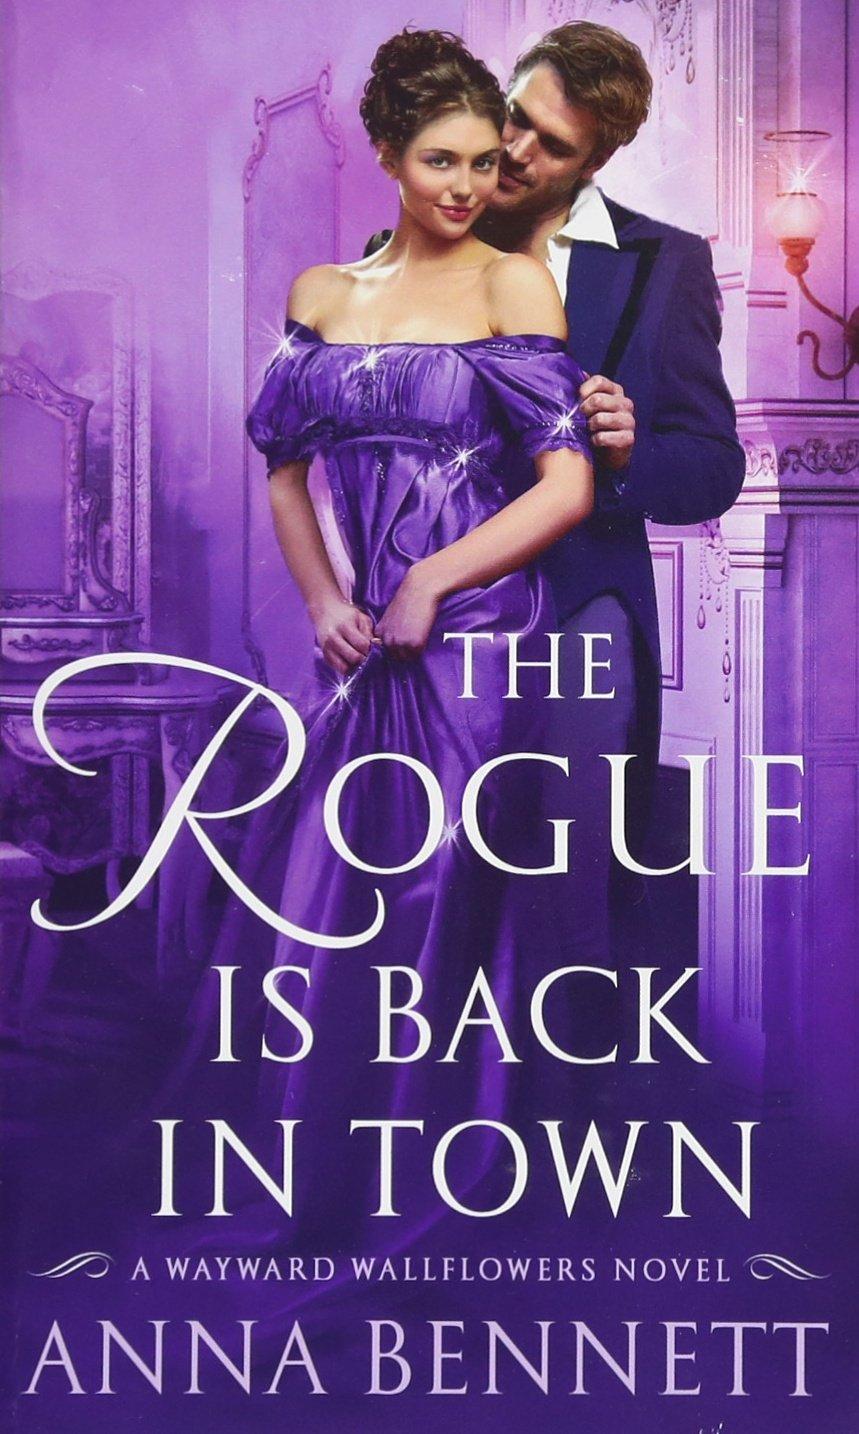 Download The Rogue Is Back in Town: A Wayward Wallflowers Novel (The Wayward Wallflowers) ebook